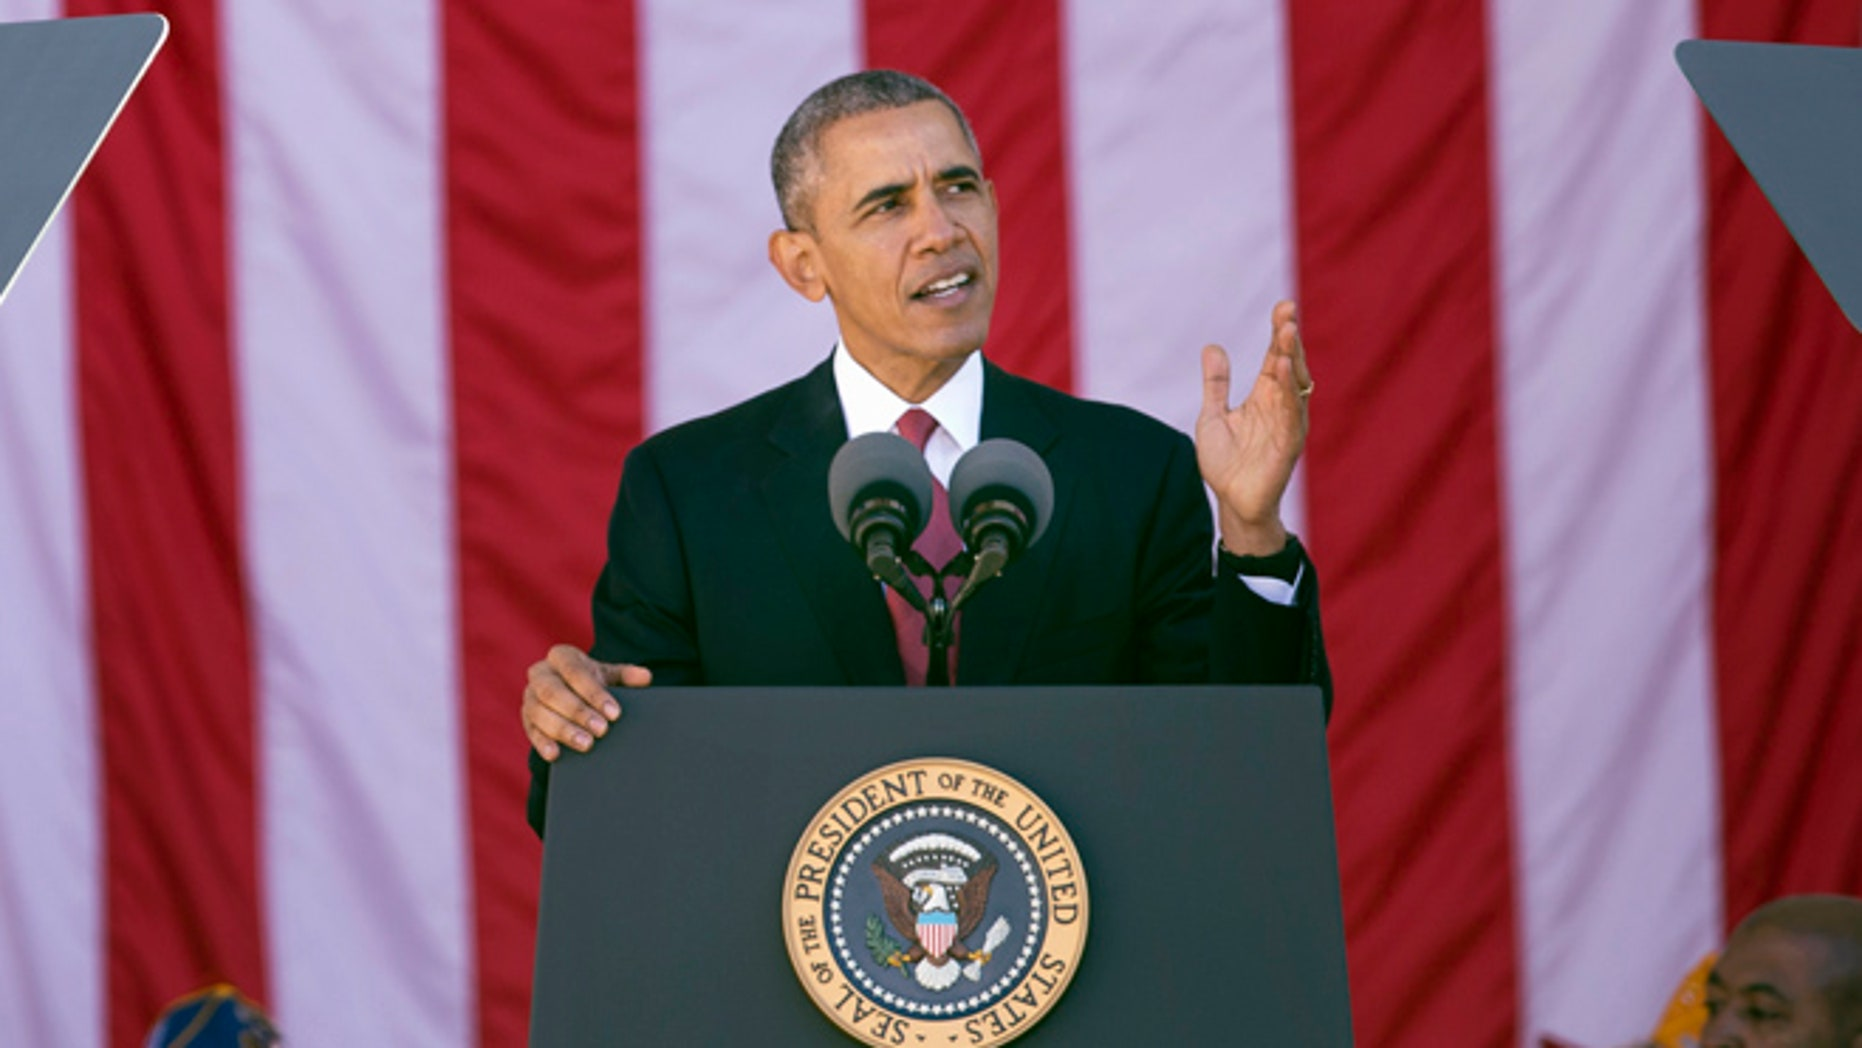 Nov. 11, 2015: President Obama speaks during the annual National Veterans Day commemoration at Arlington National Cemetery in Arlington, Va. (AP)